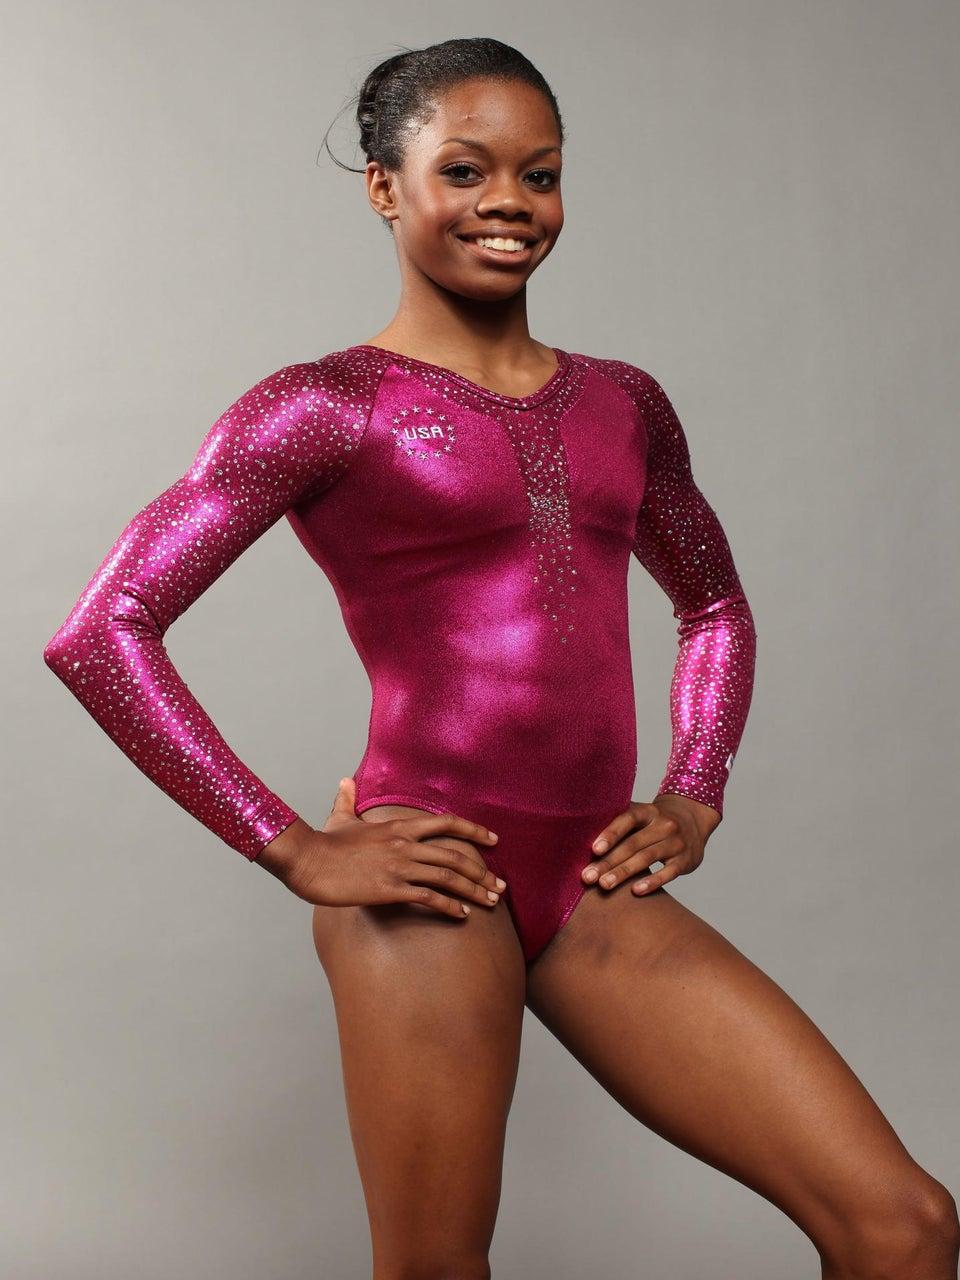 Get a Peek Inside Gabby Douglas' Journey to the 2016 Olympics in New TV Show